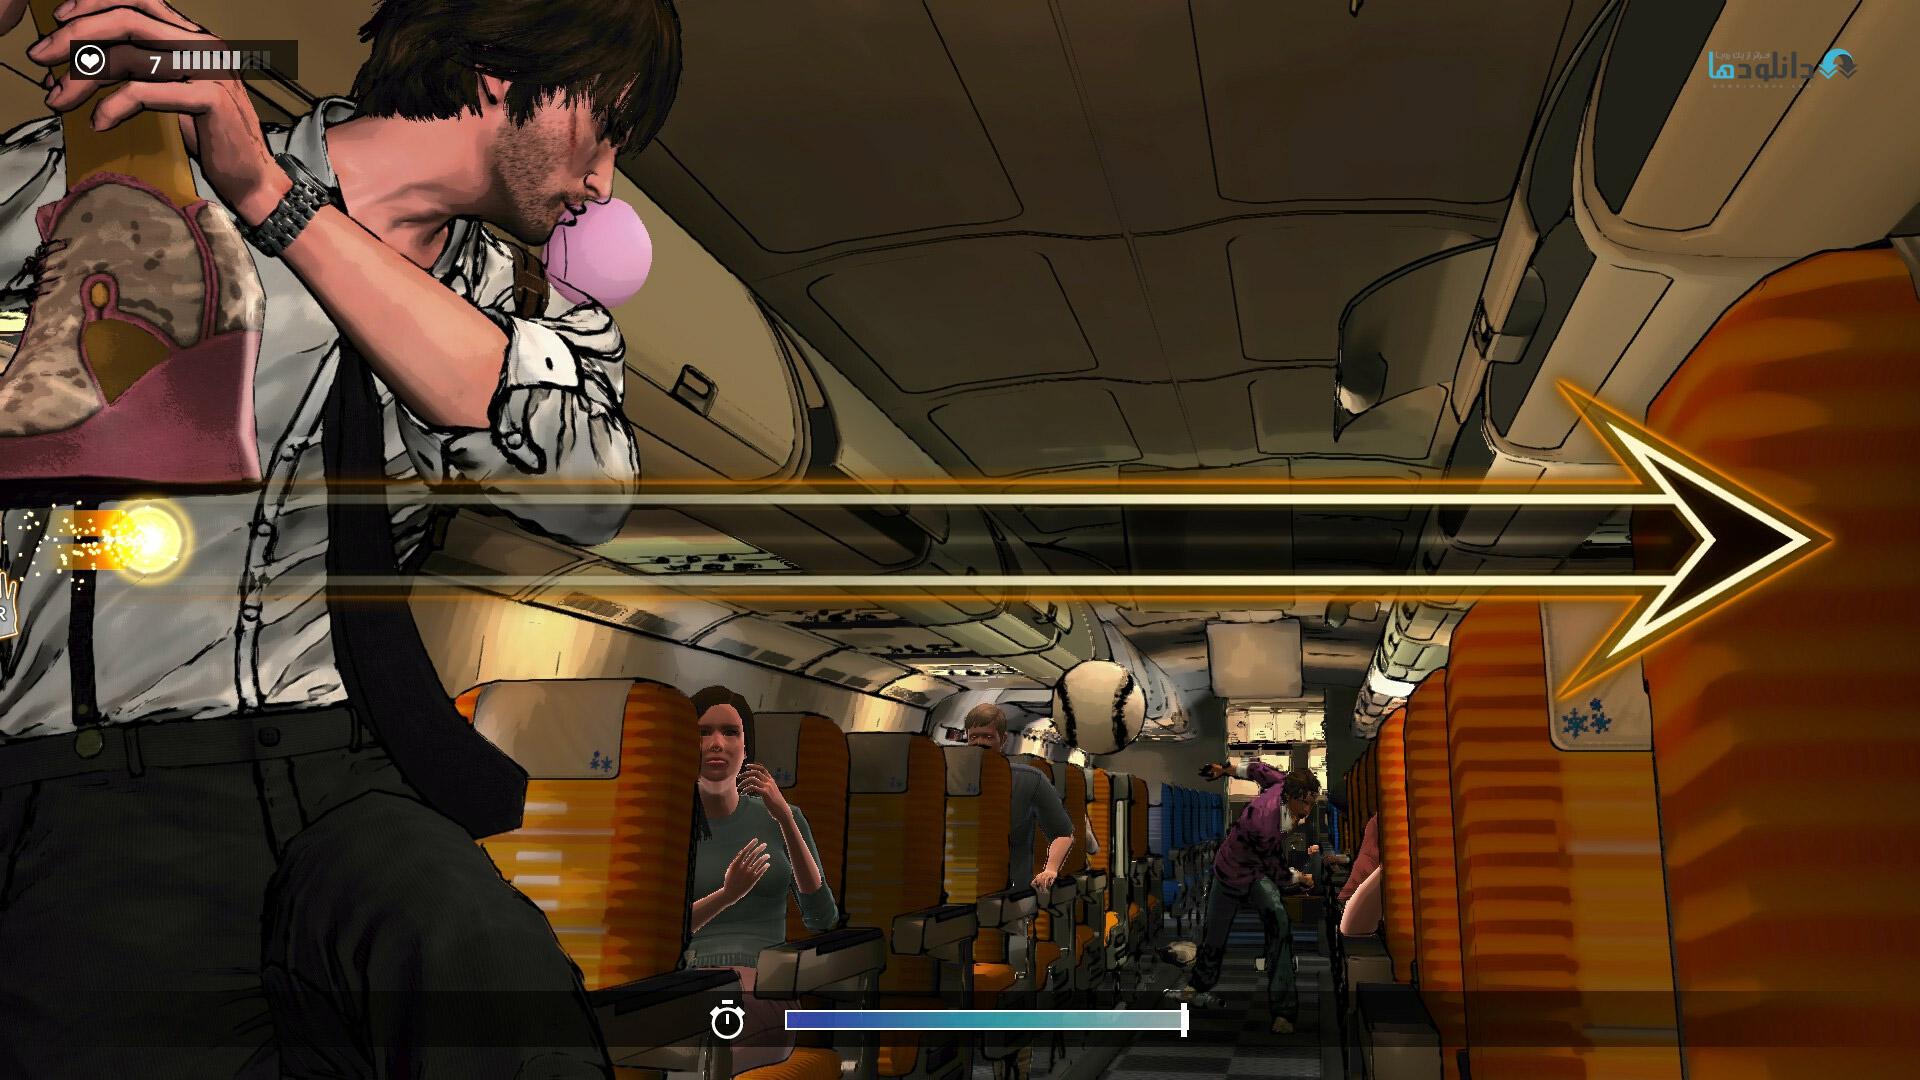 http://img5.downloadha.com/hosein/Game/June%202015/06/D4-Dark-Dreams-Dont-Die-Season-One-screenshots-06-large.jpg